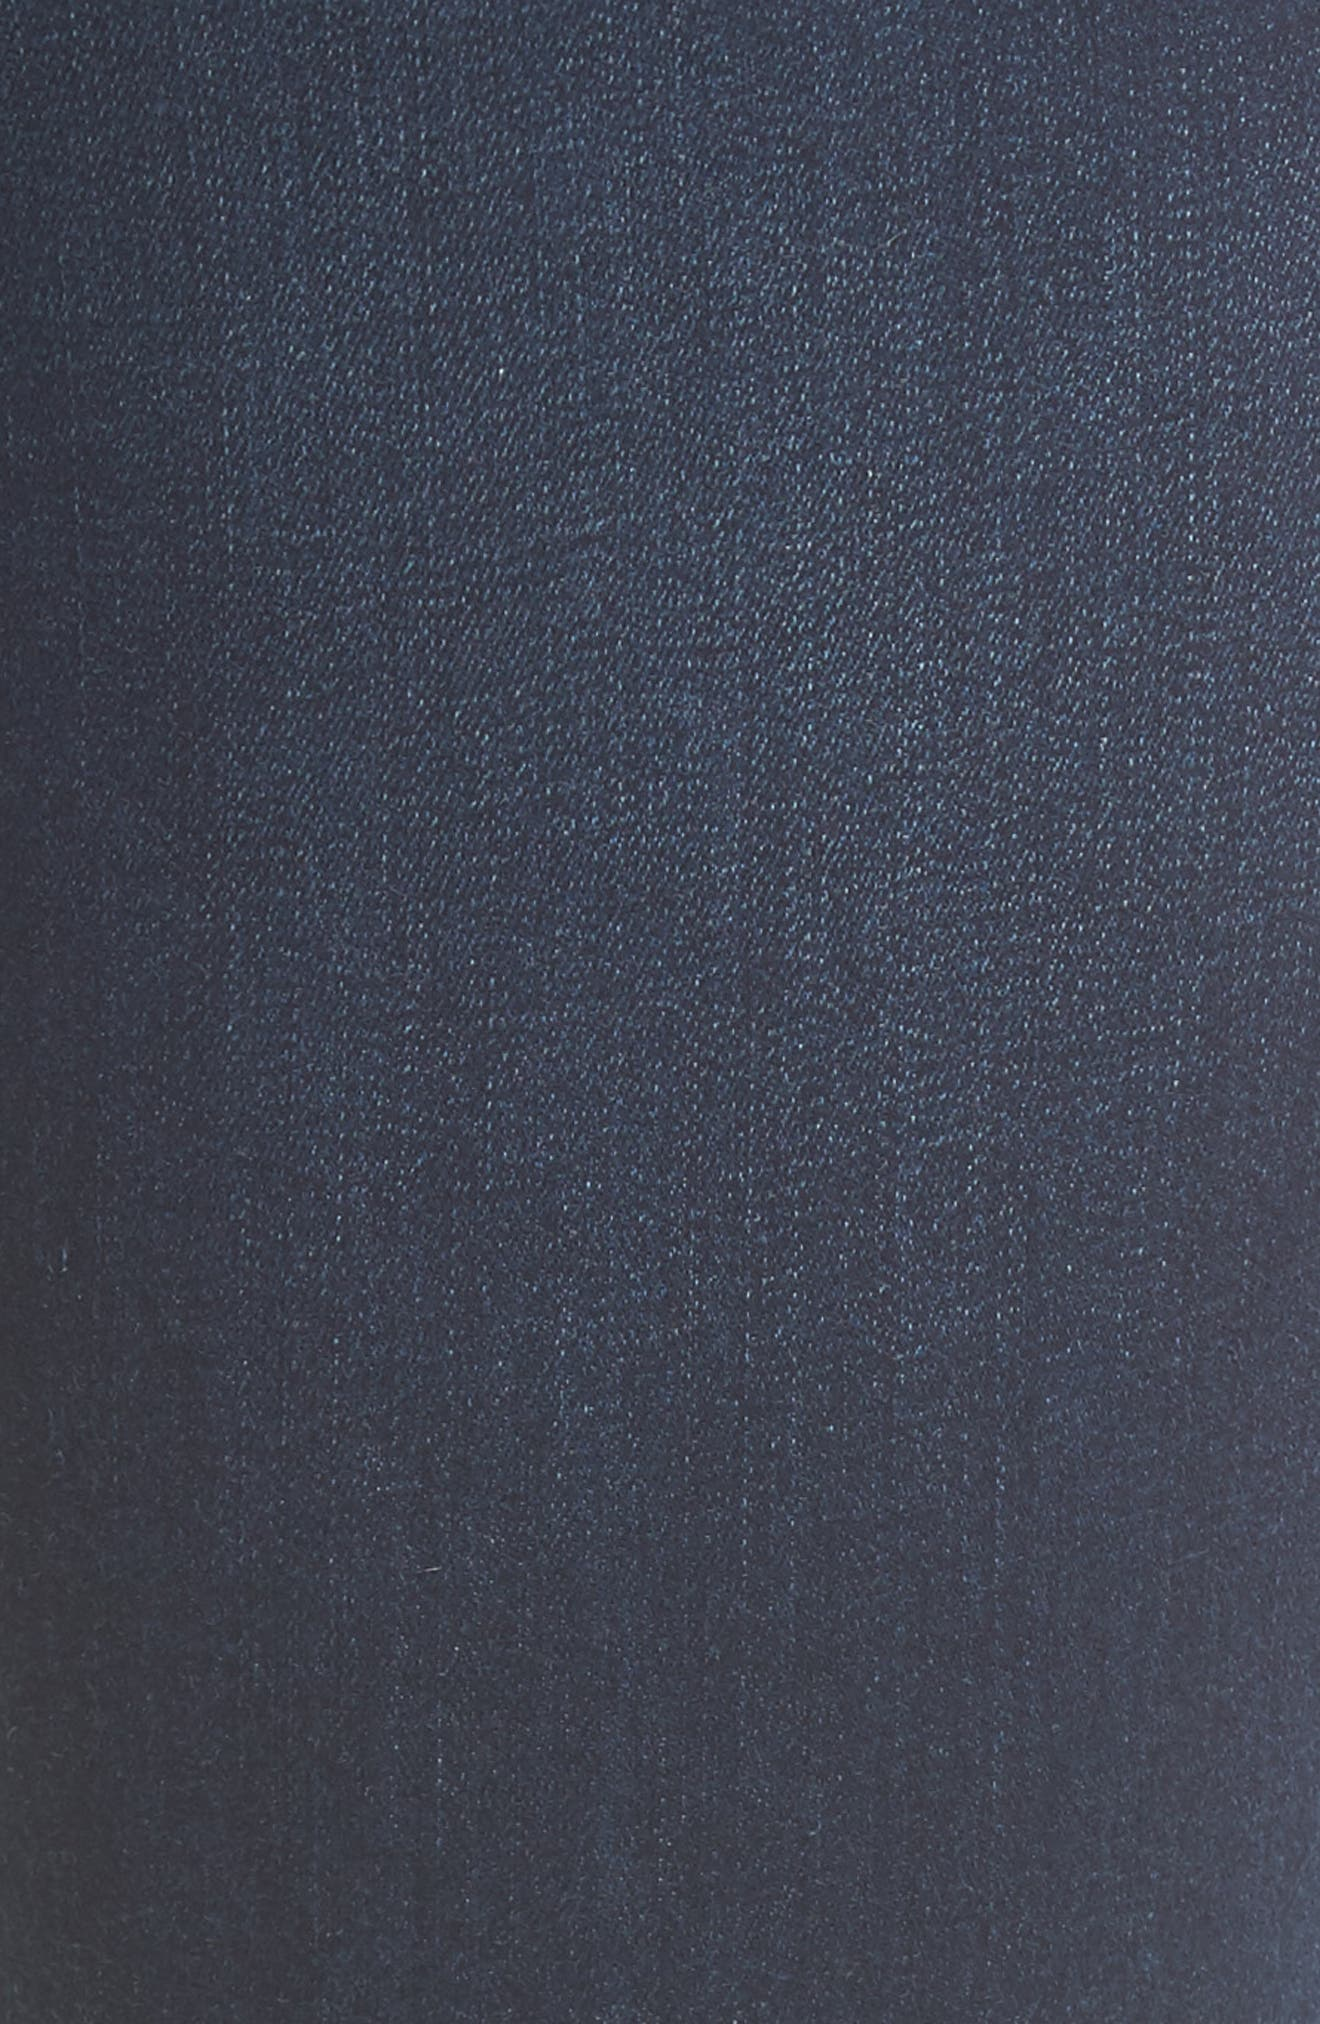 Itty Bitty Split Hem Bootcut Jeans,                             Alternate thumbnail 5, color,                             420